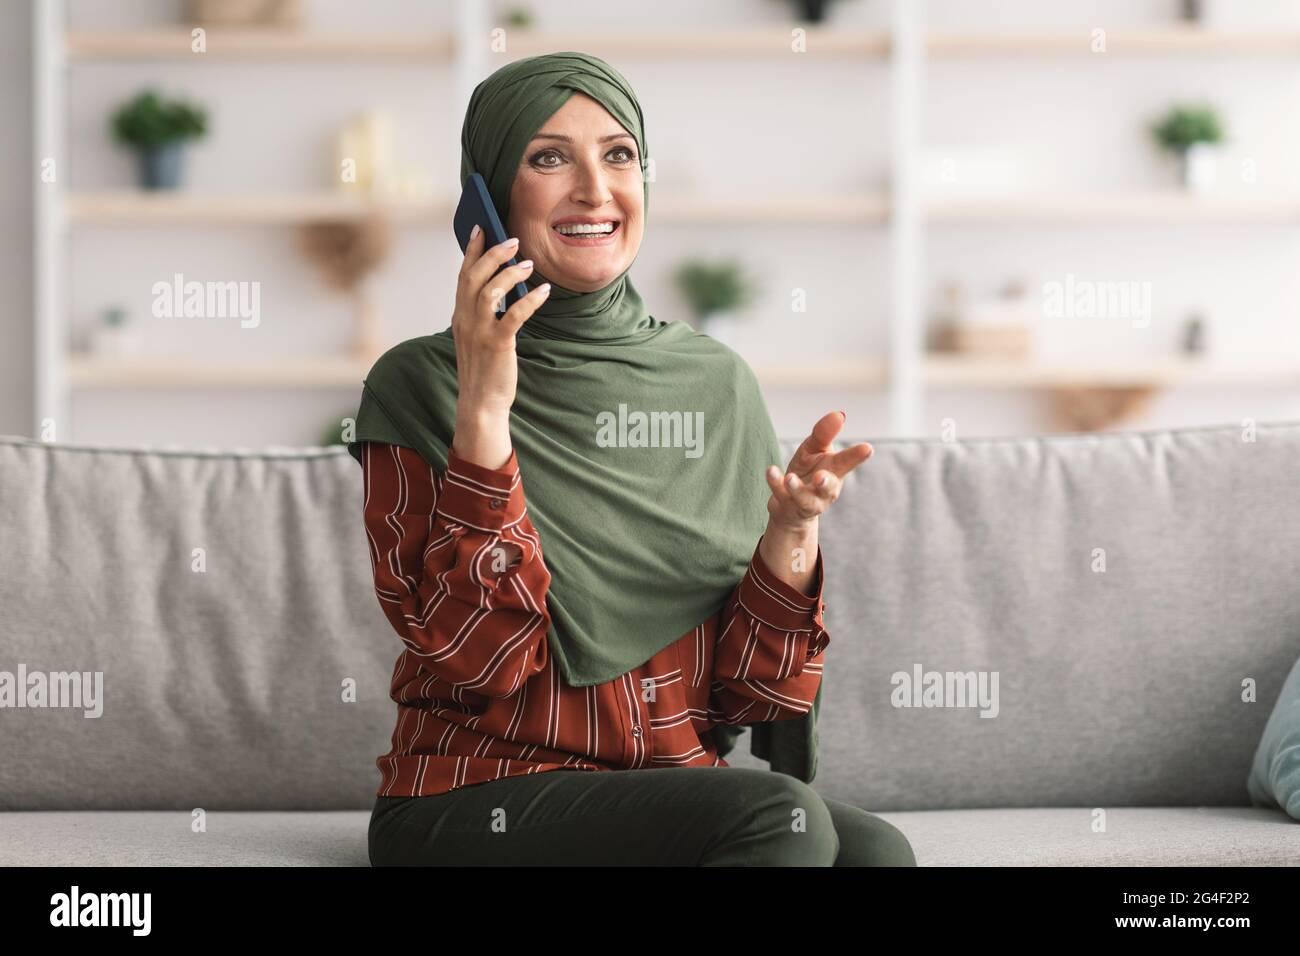 Rheinloft den widerstehen slave abenddinner. Page 2 Arab Woman Sitting On Sofa High Resolution Stock Photography And Images Alamy